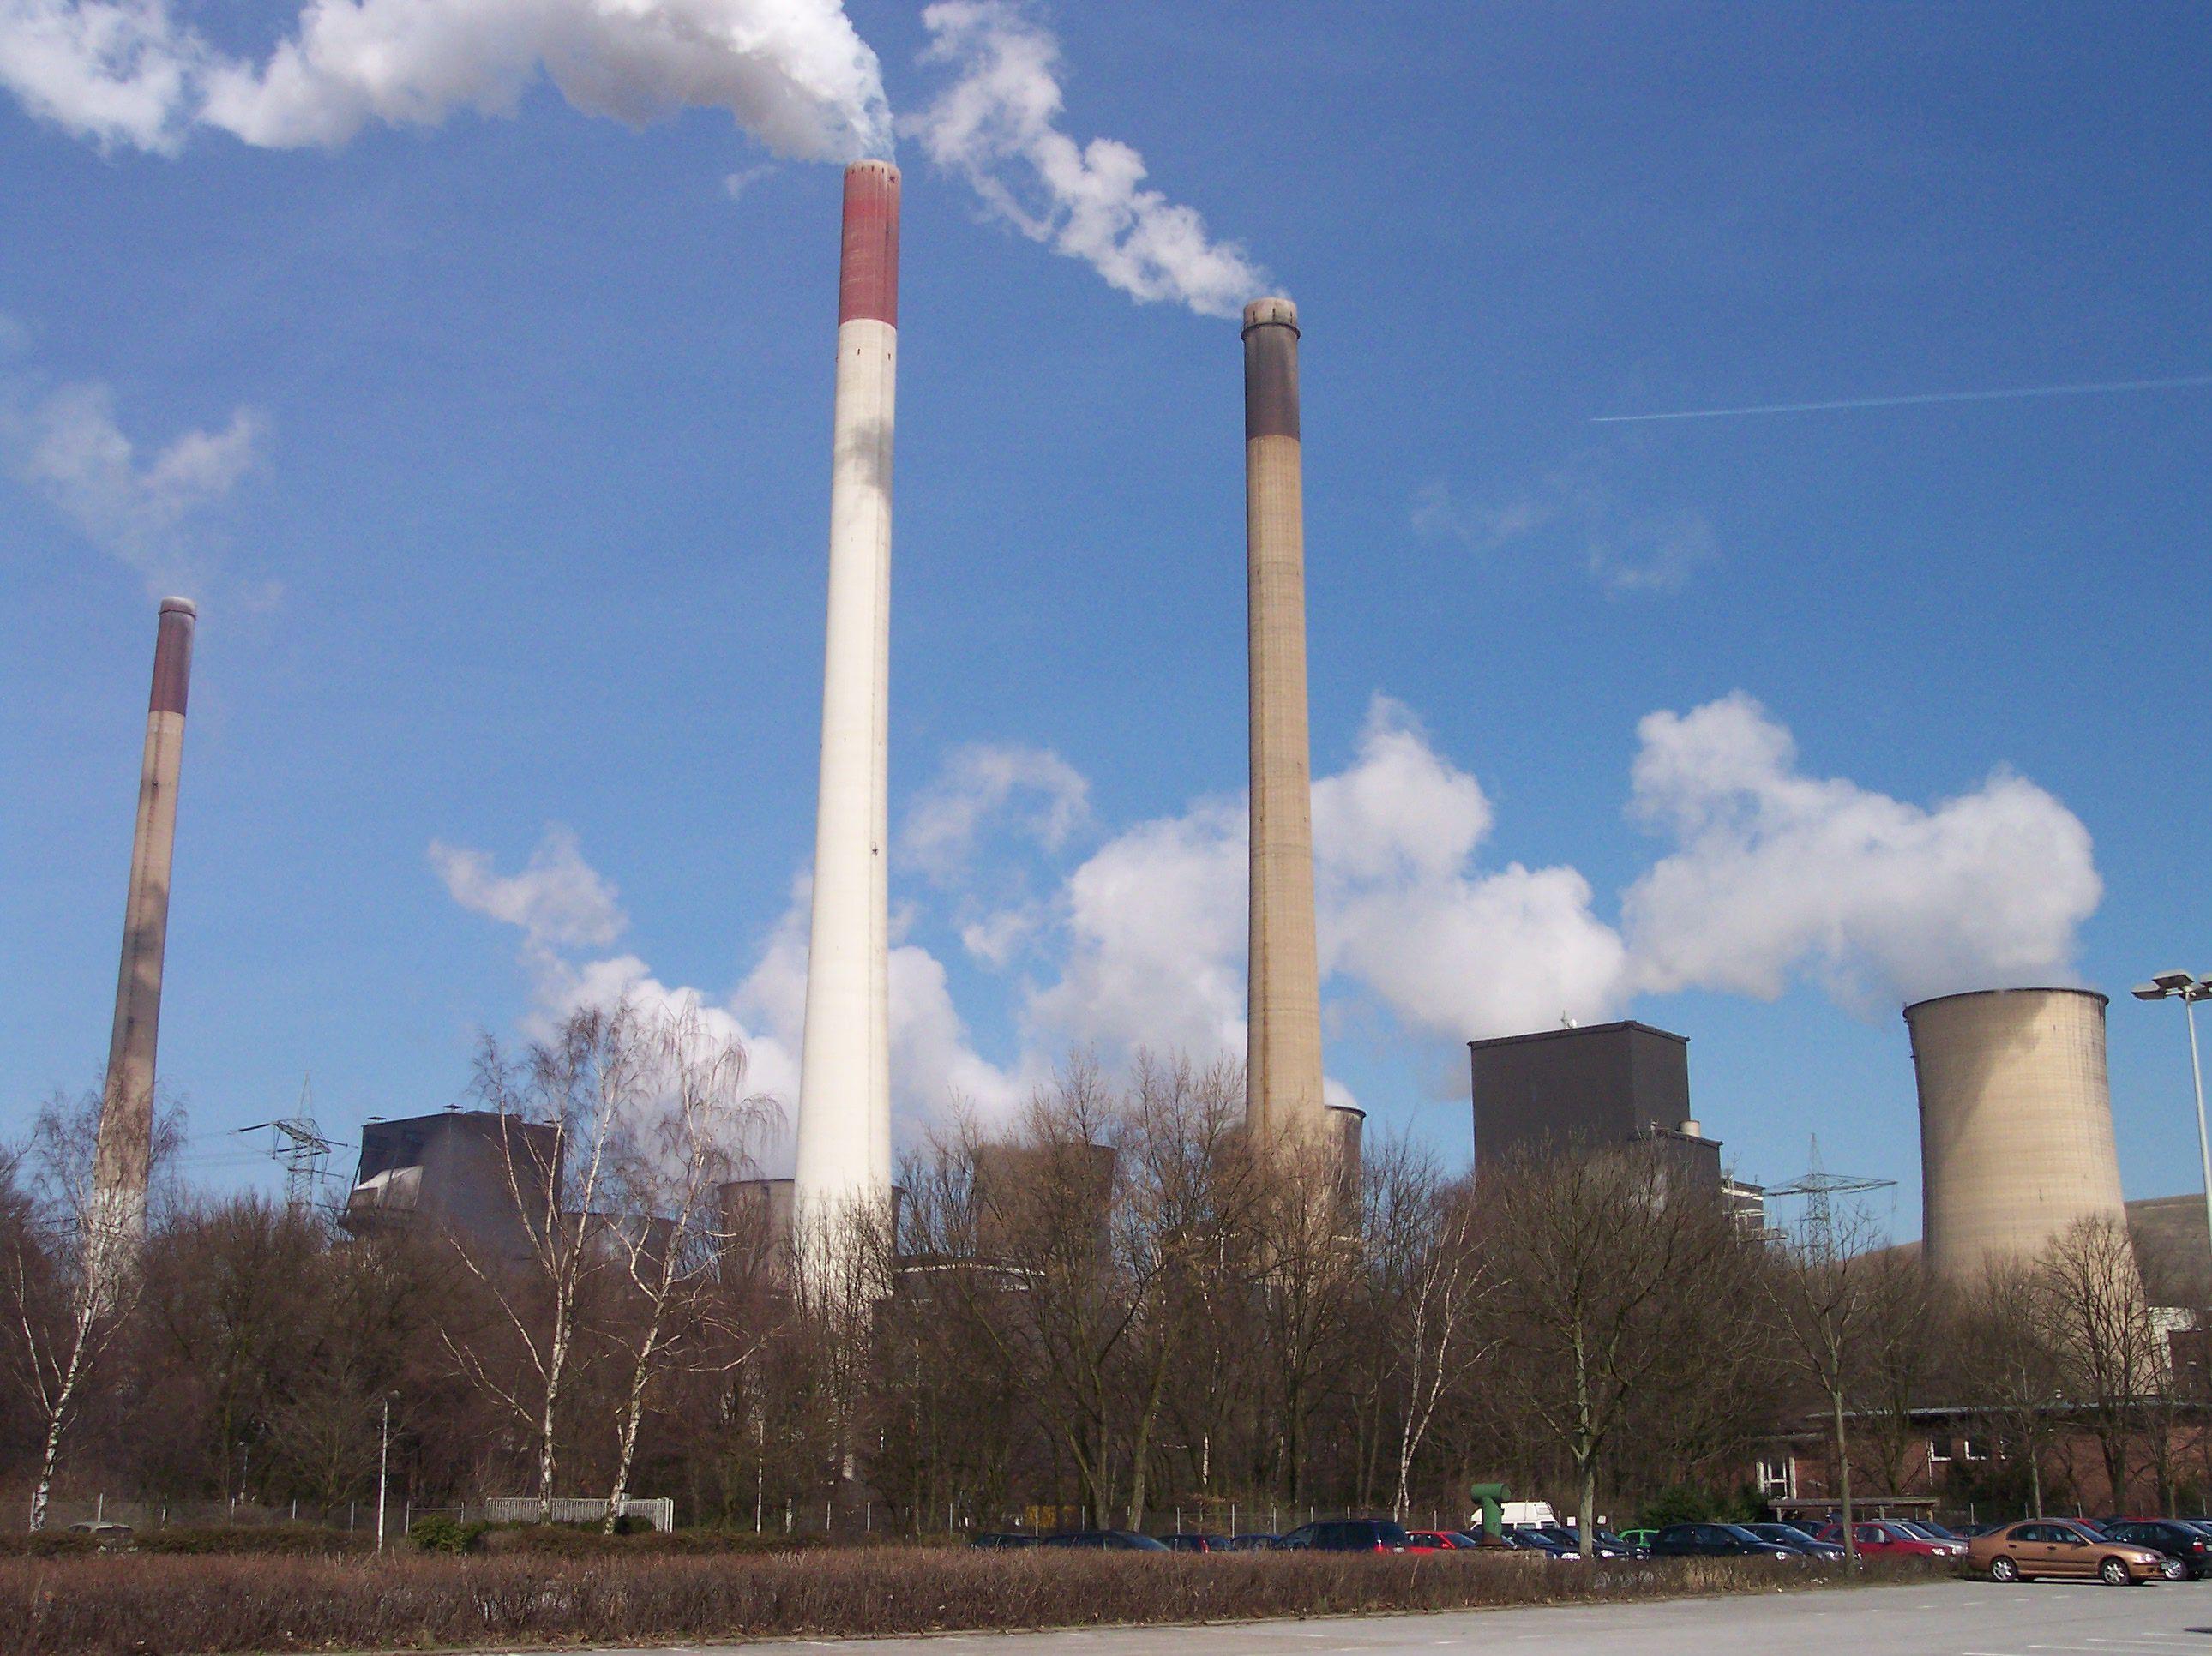 emissioni-gas-serra.jpg